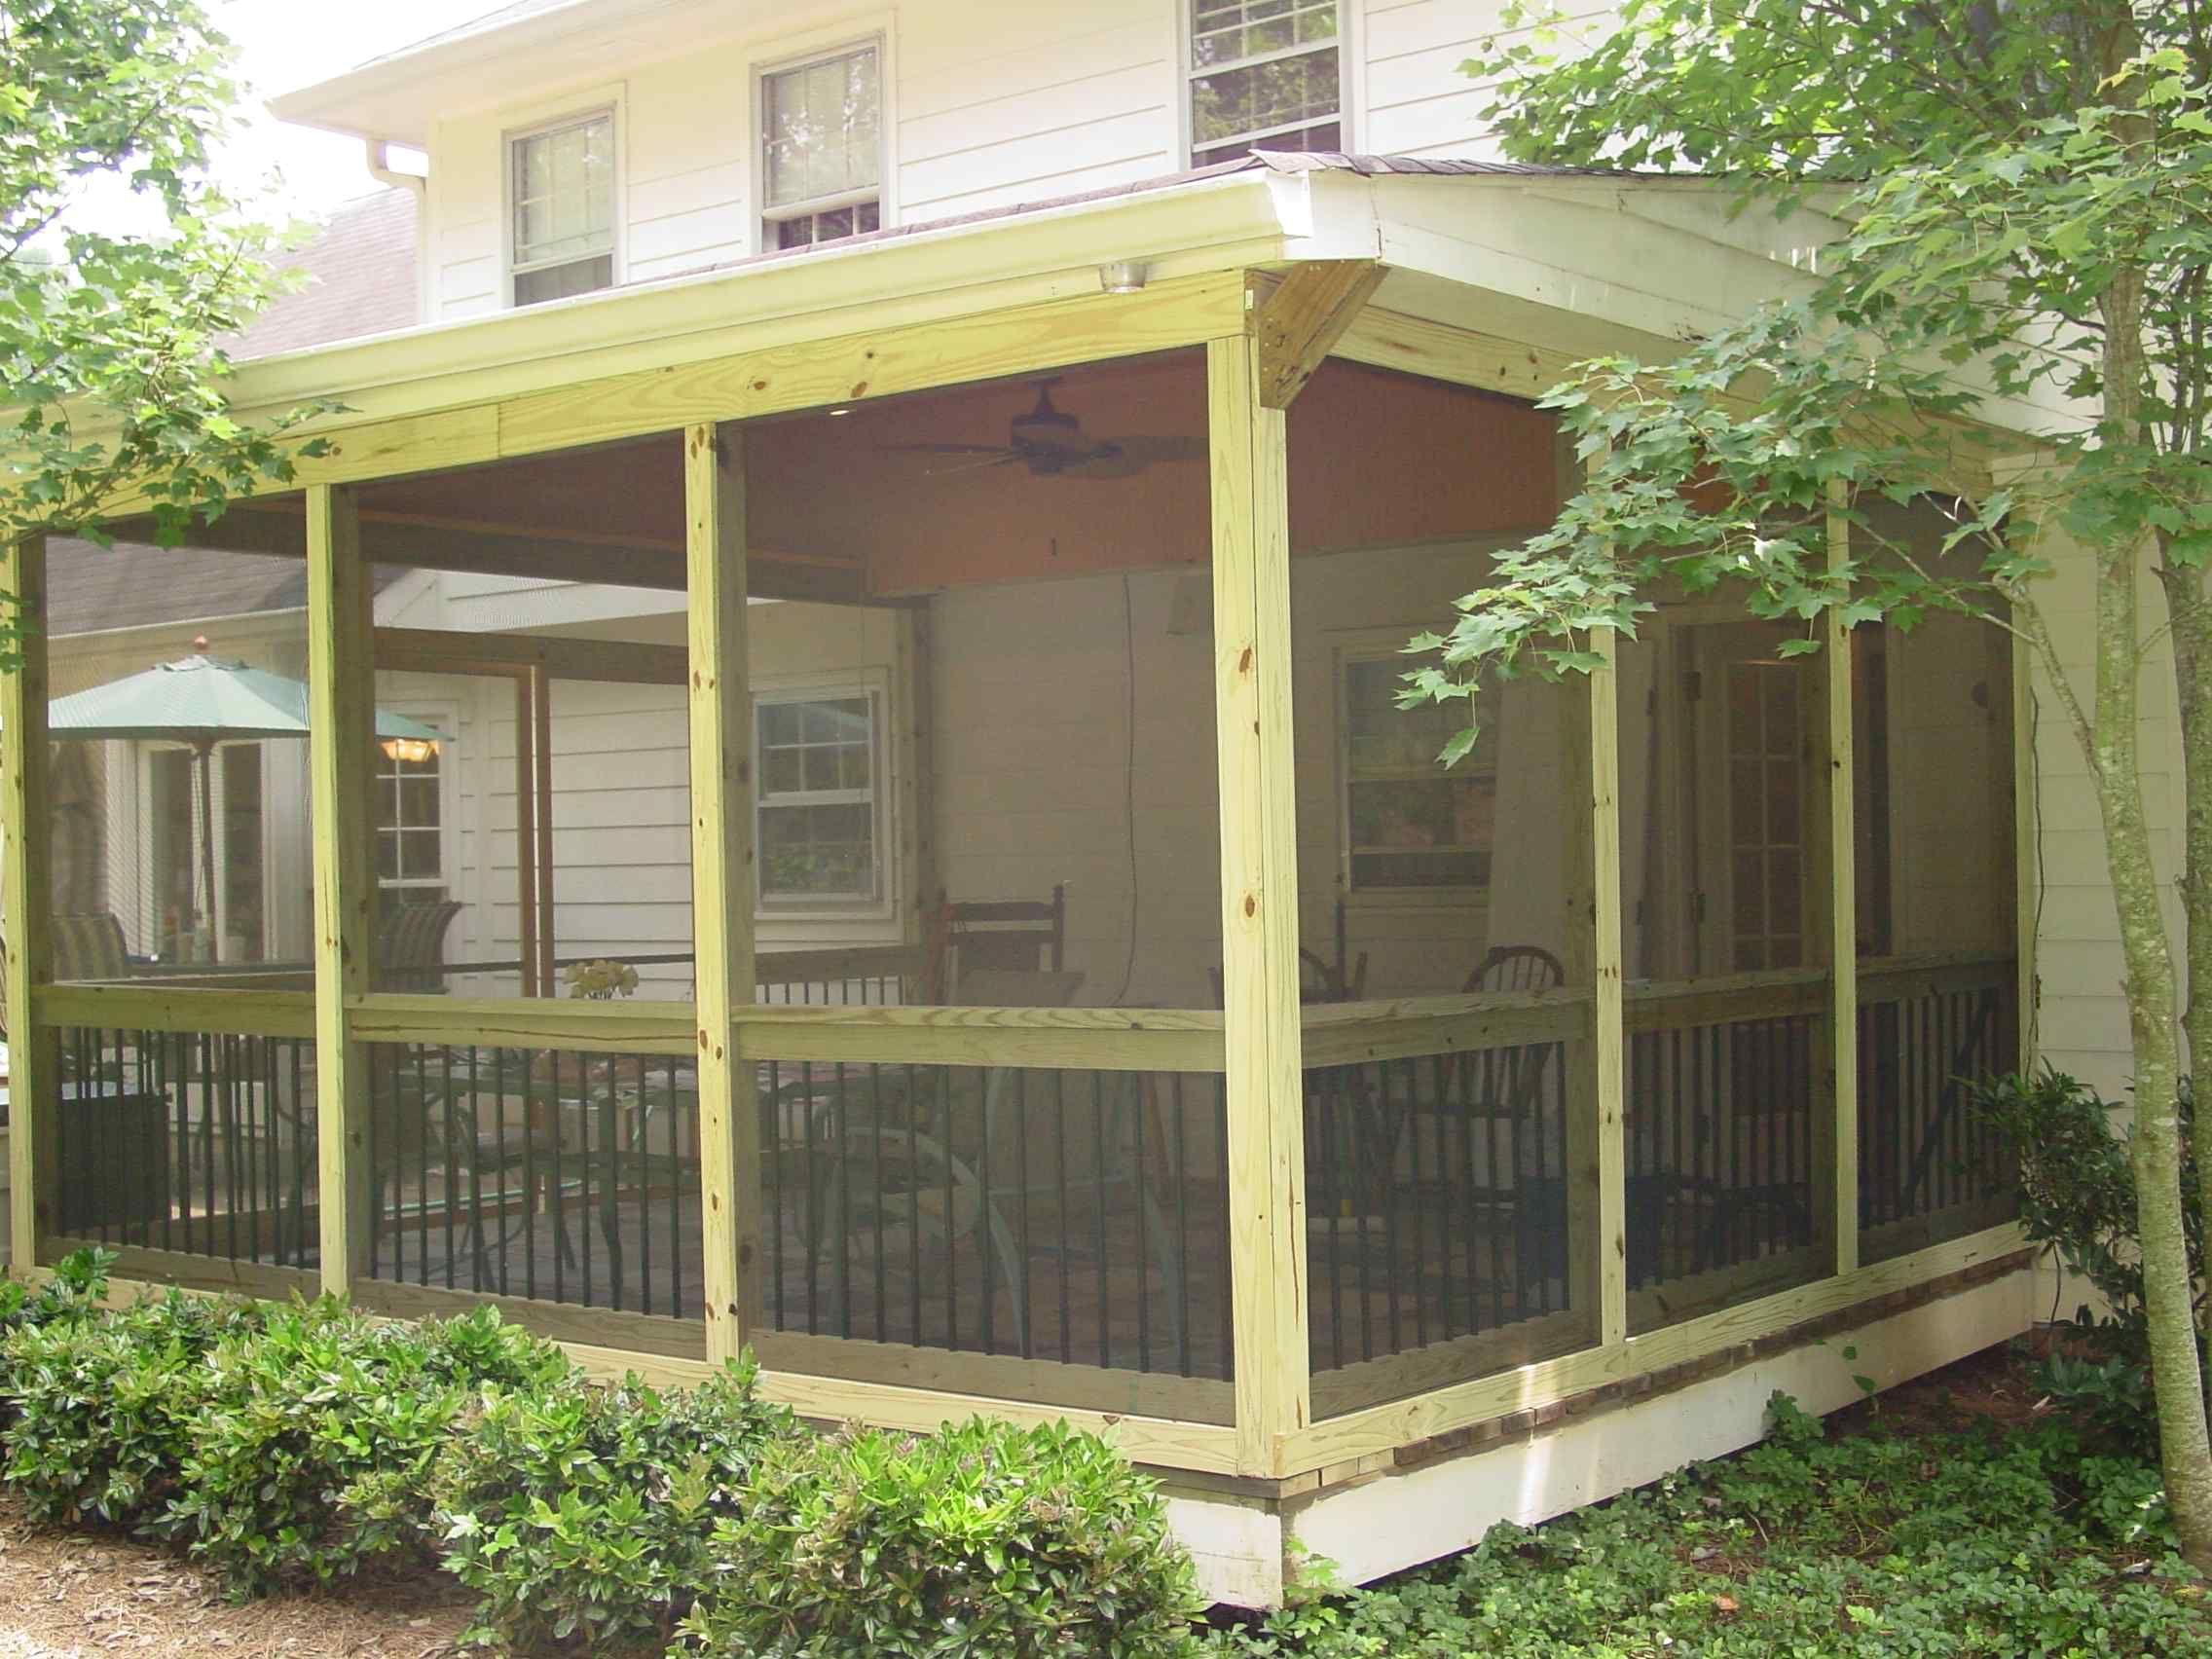 screened in porch plans to build or modify screen porch kits porch kits and screened porches - Screened In Porch Ideas Design